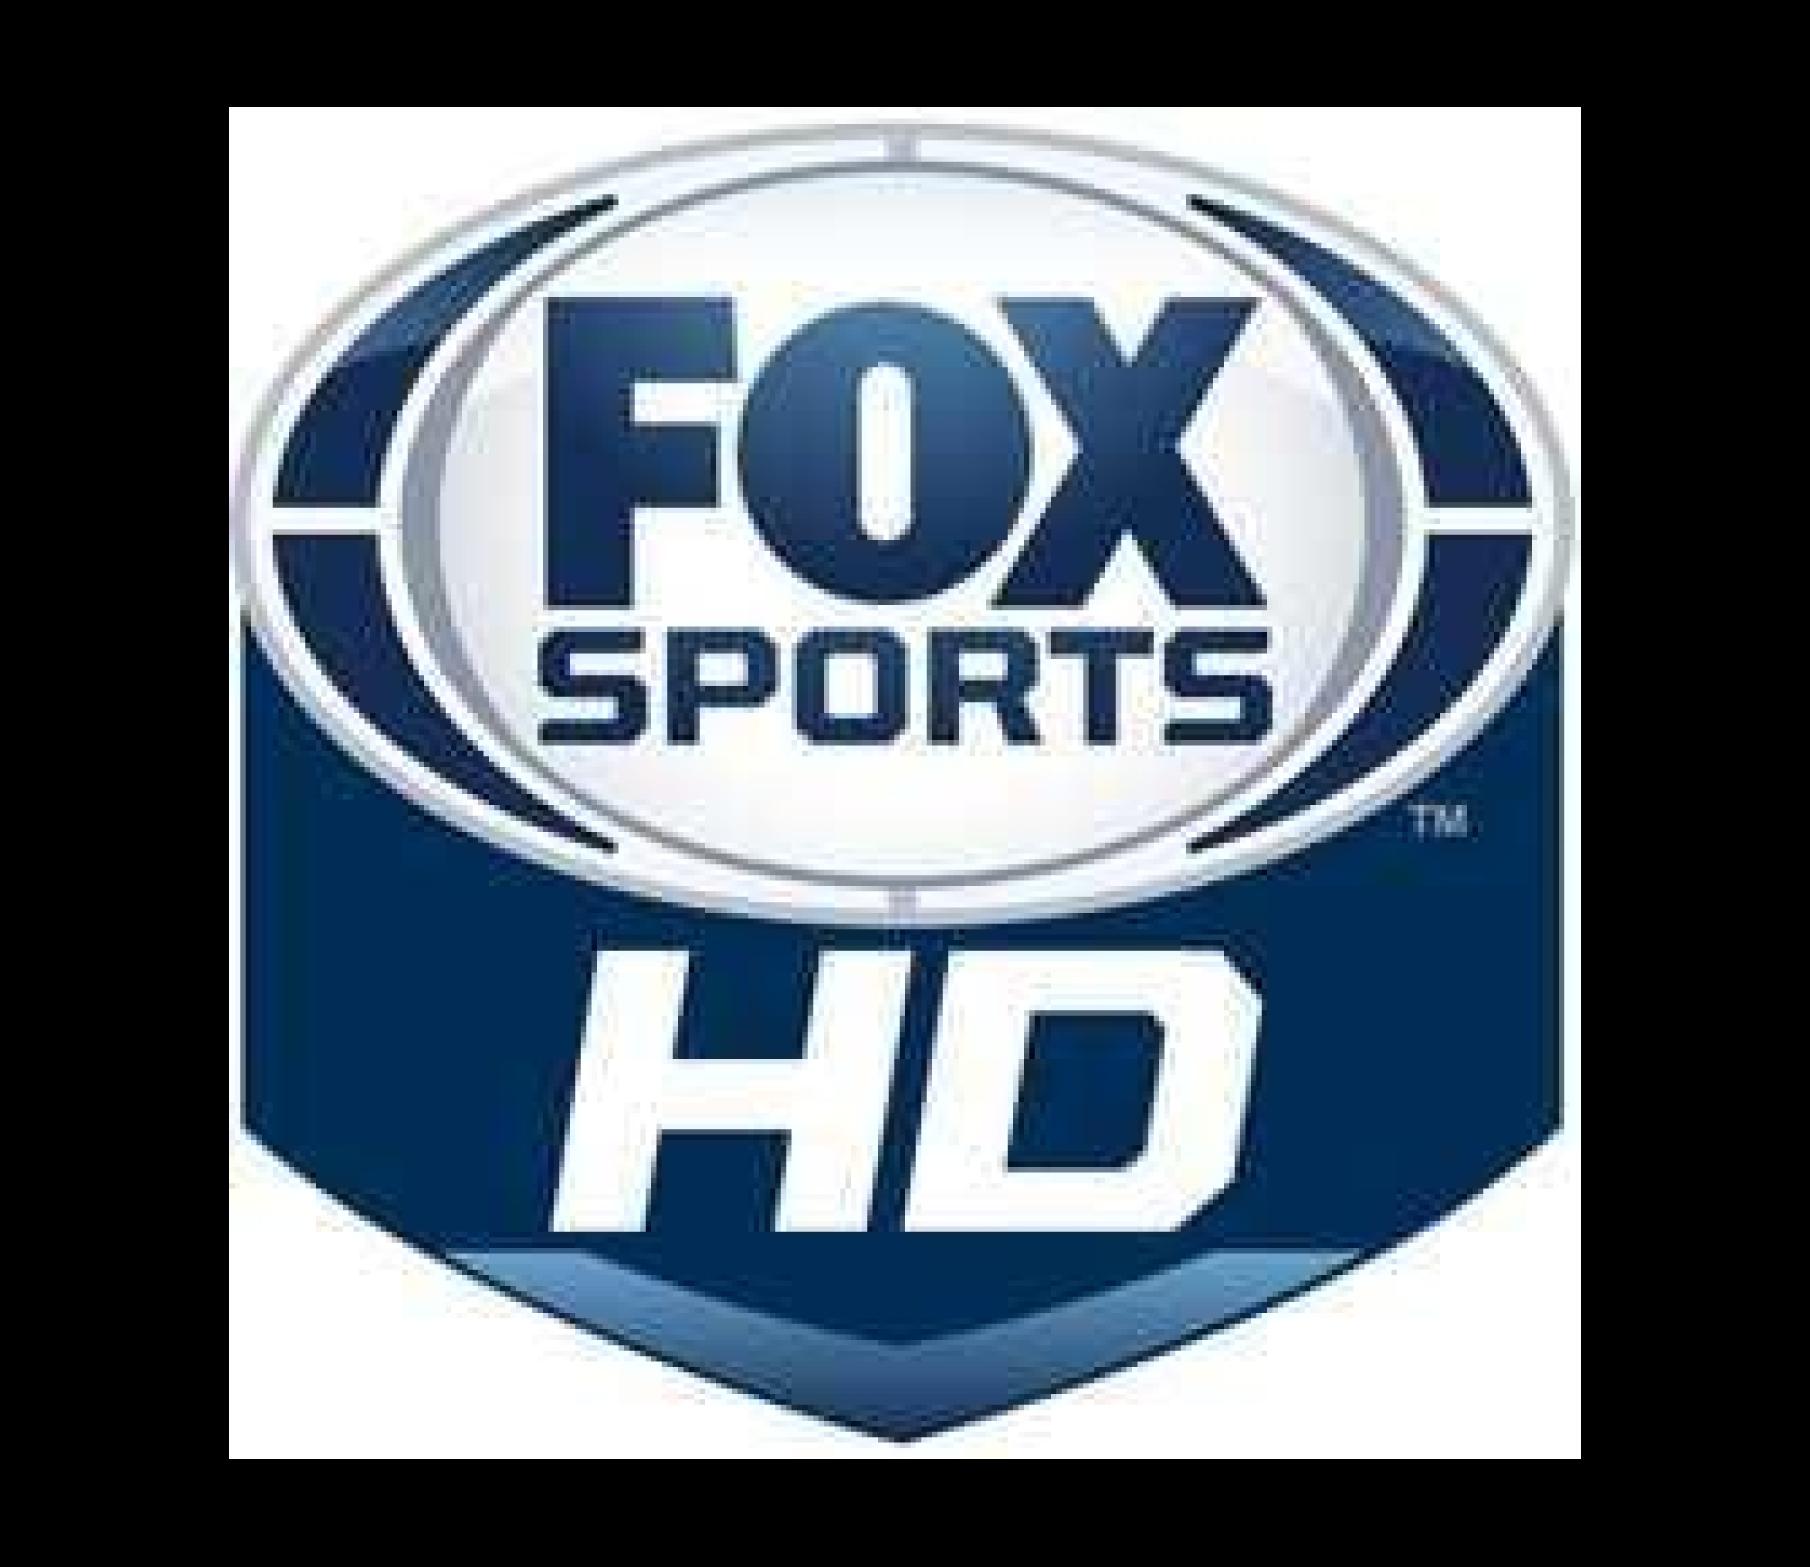 Canal FOX Sports HD